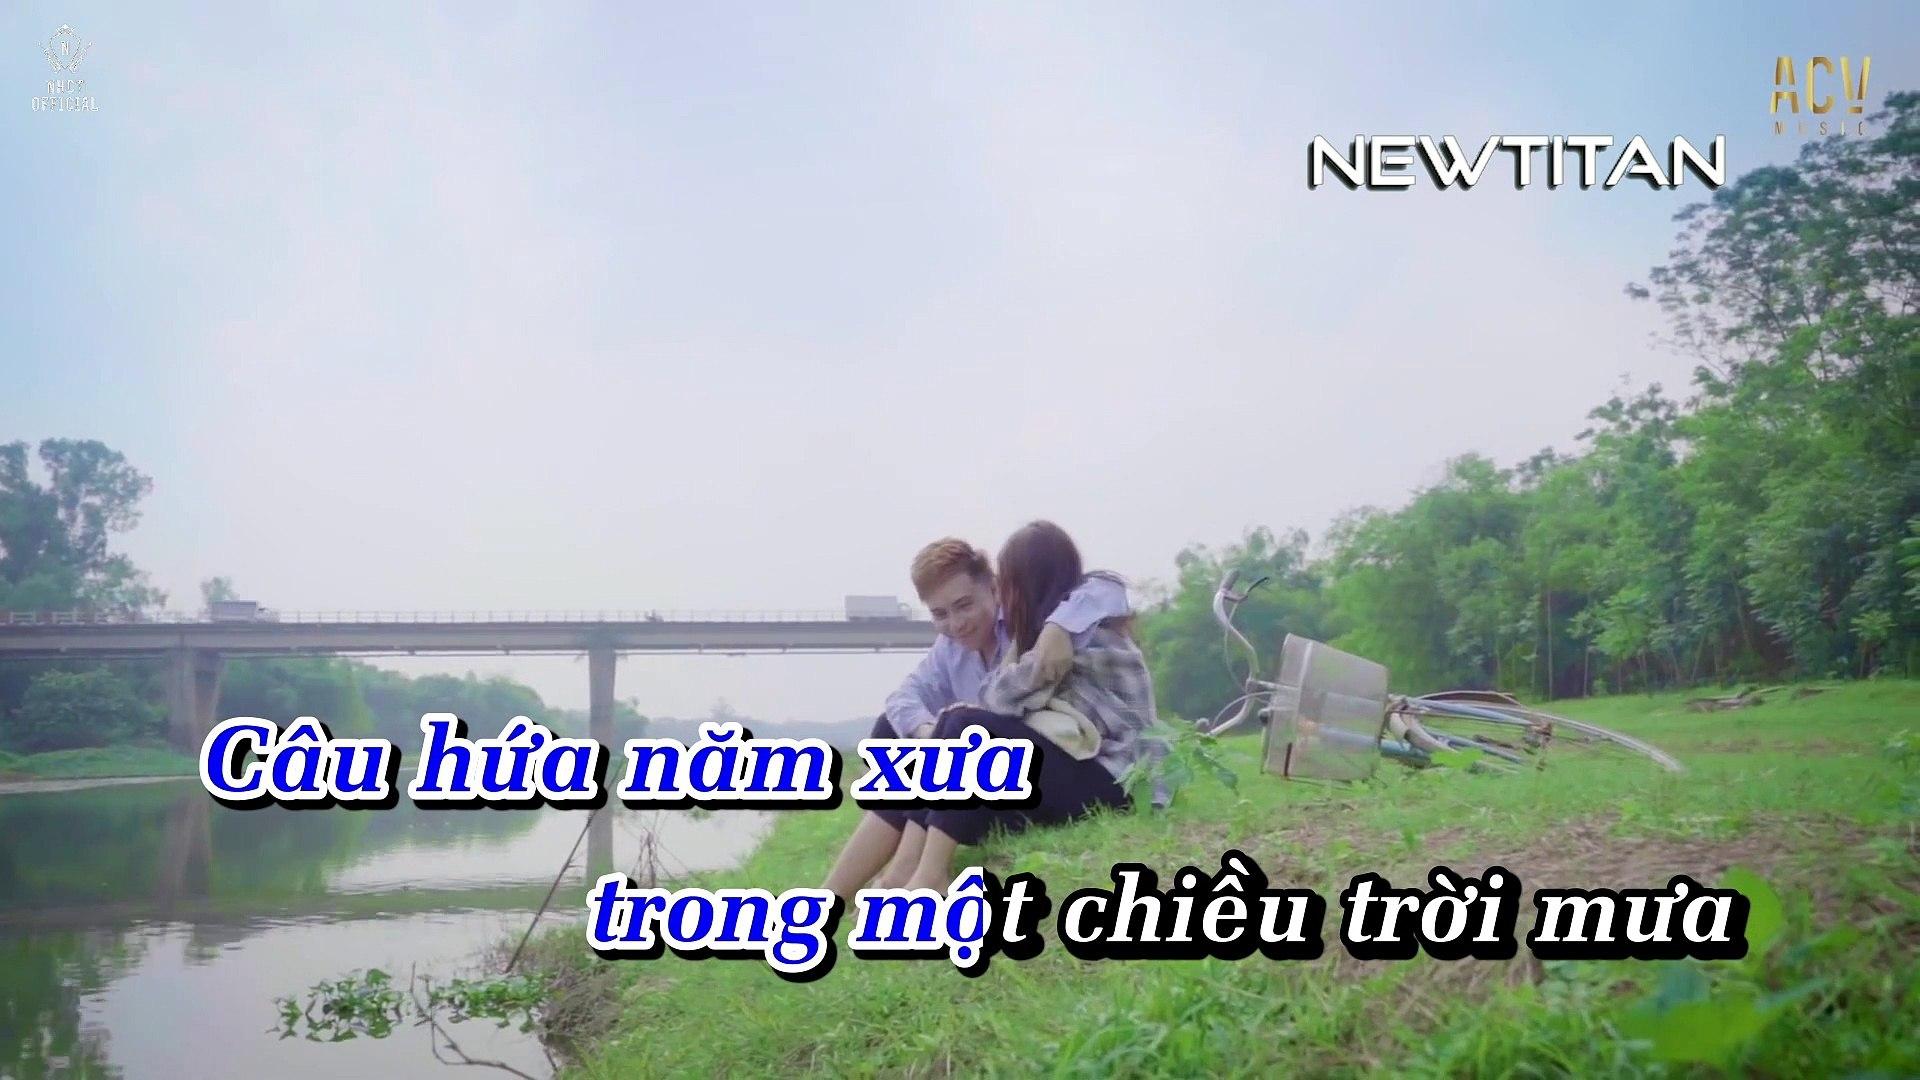 [Karaoke] Em Ơi Lên Phố - Minh Vương M4U [Beat]